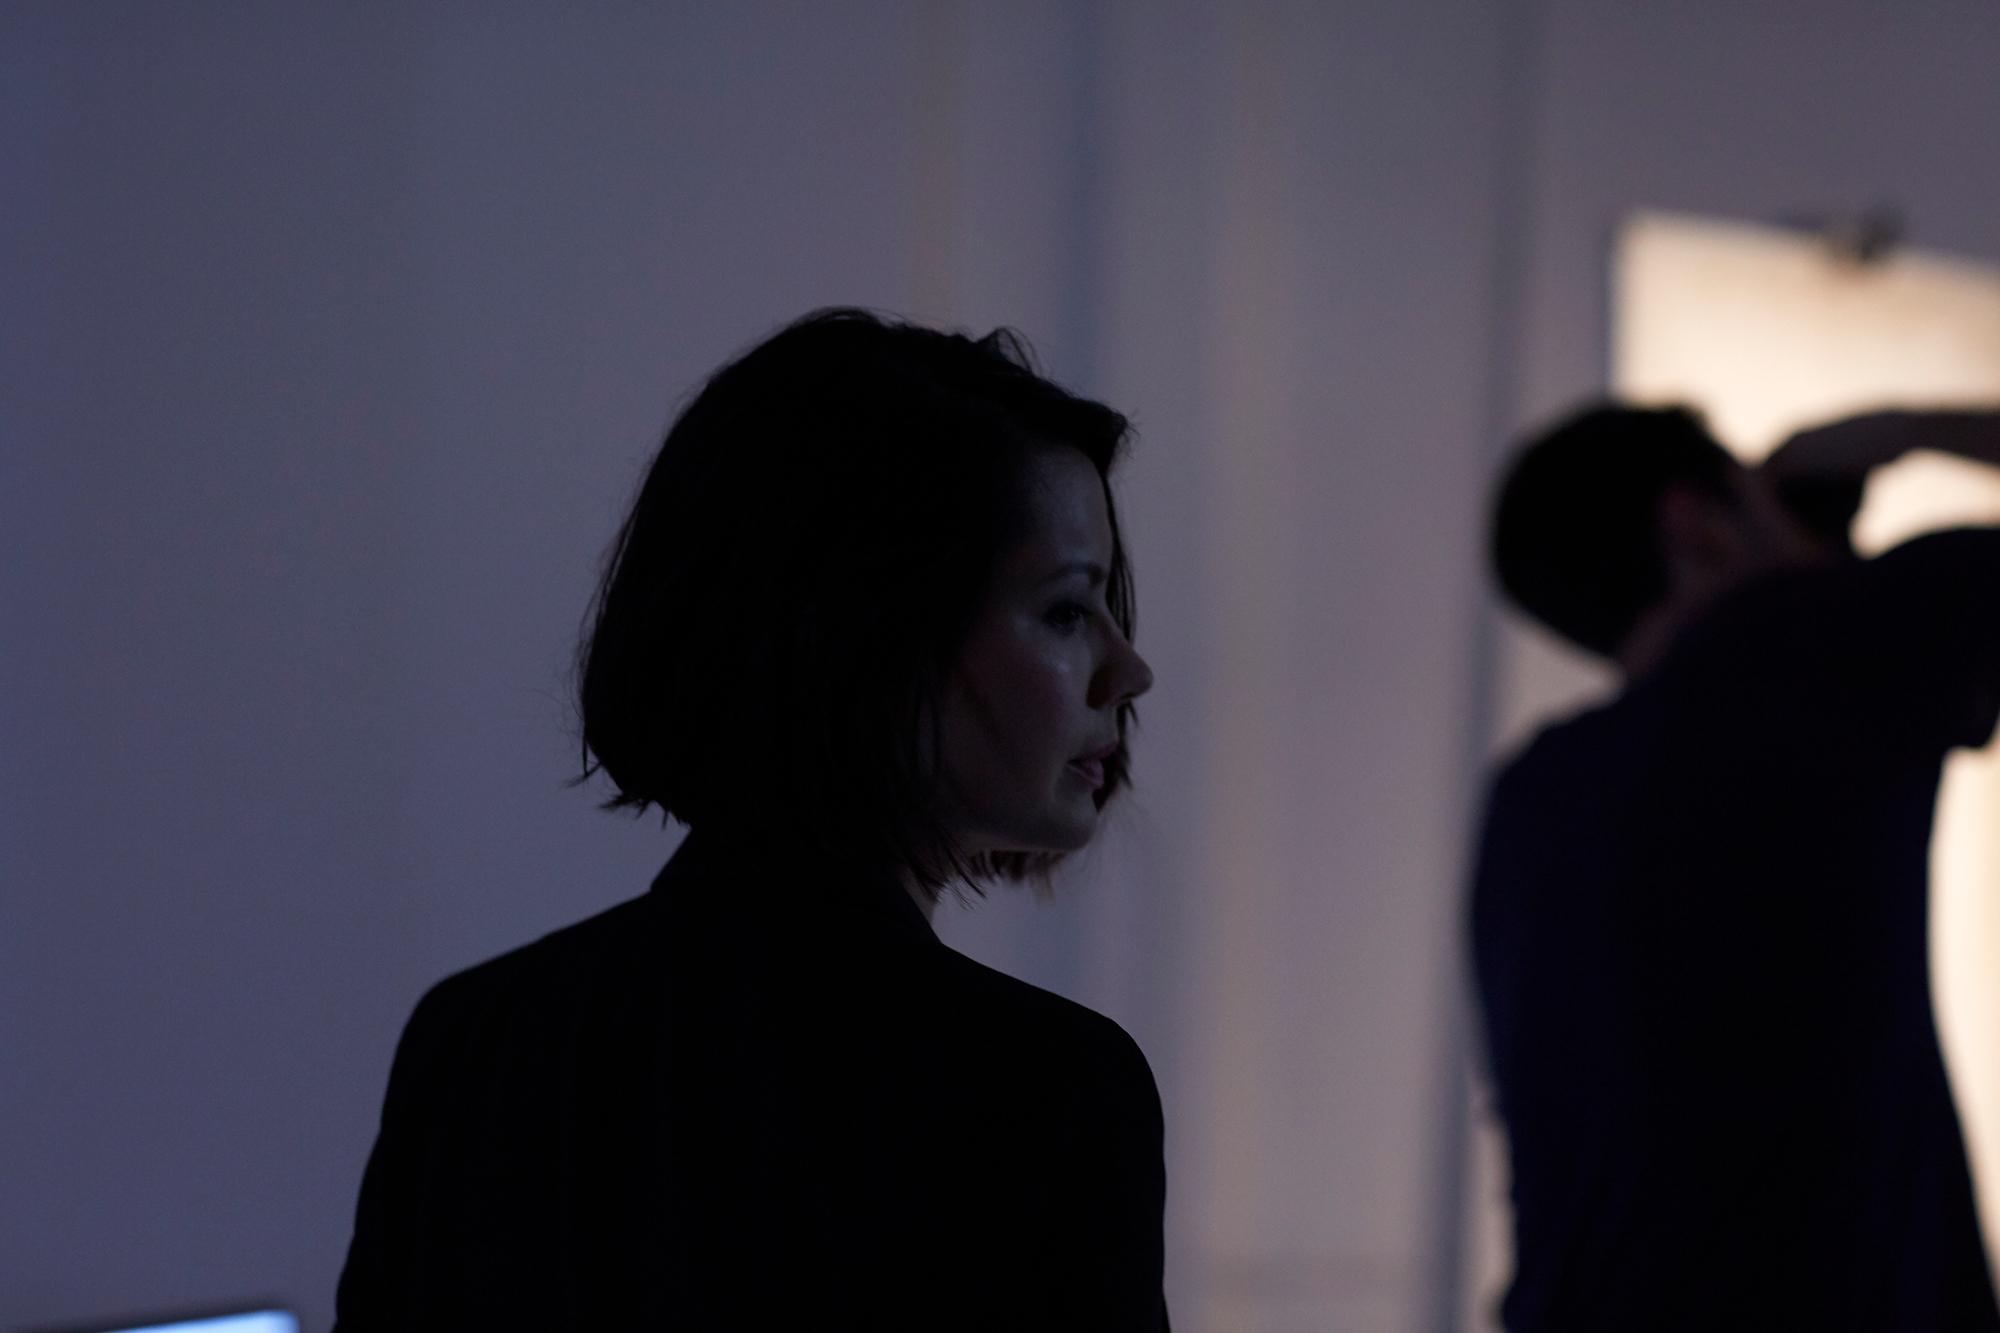 Intrusion 01 / photograph: Clare Plueckhahn